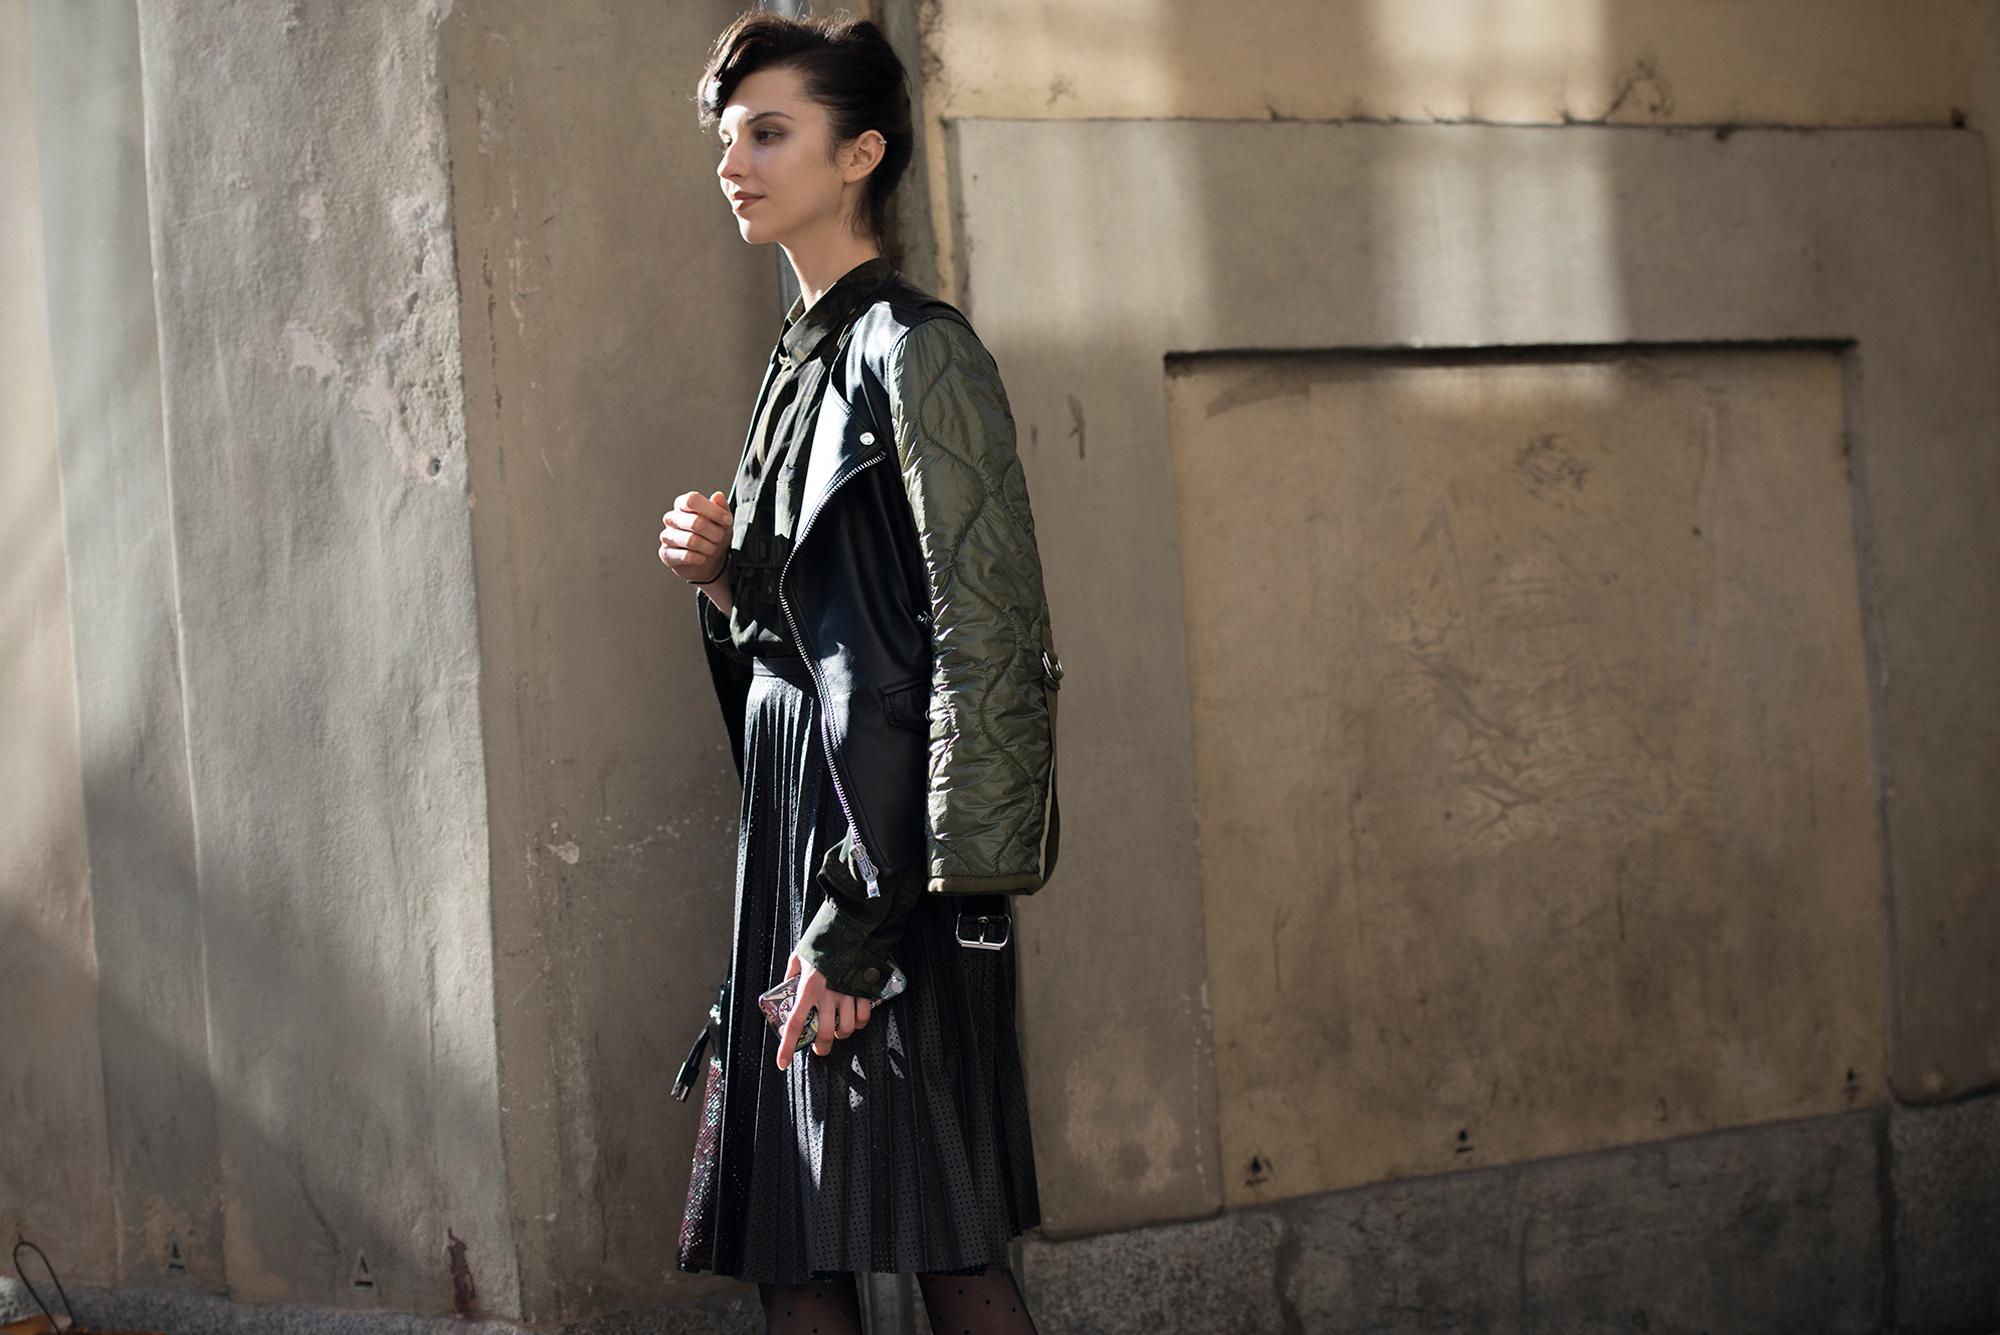 Streetsnaps Milan Fashion Week February 2017 - 3739926